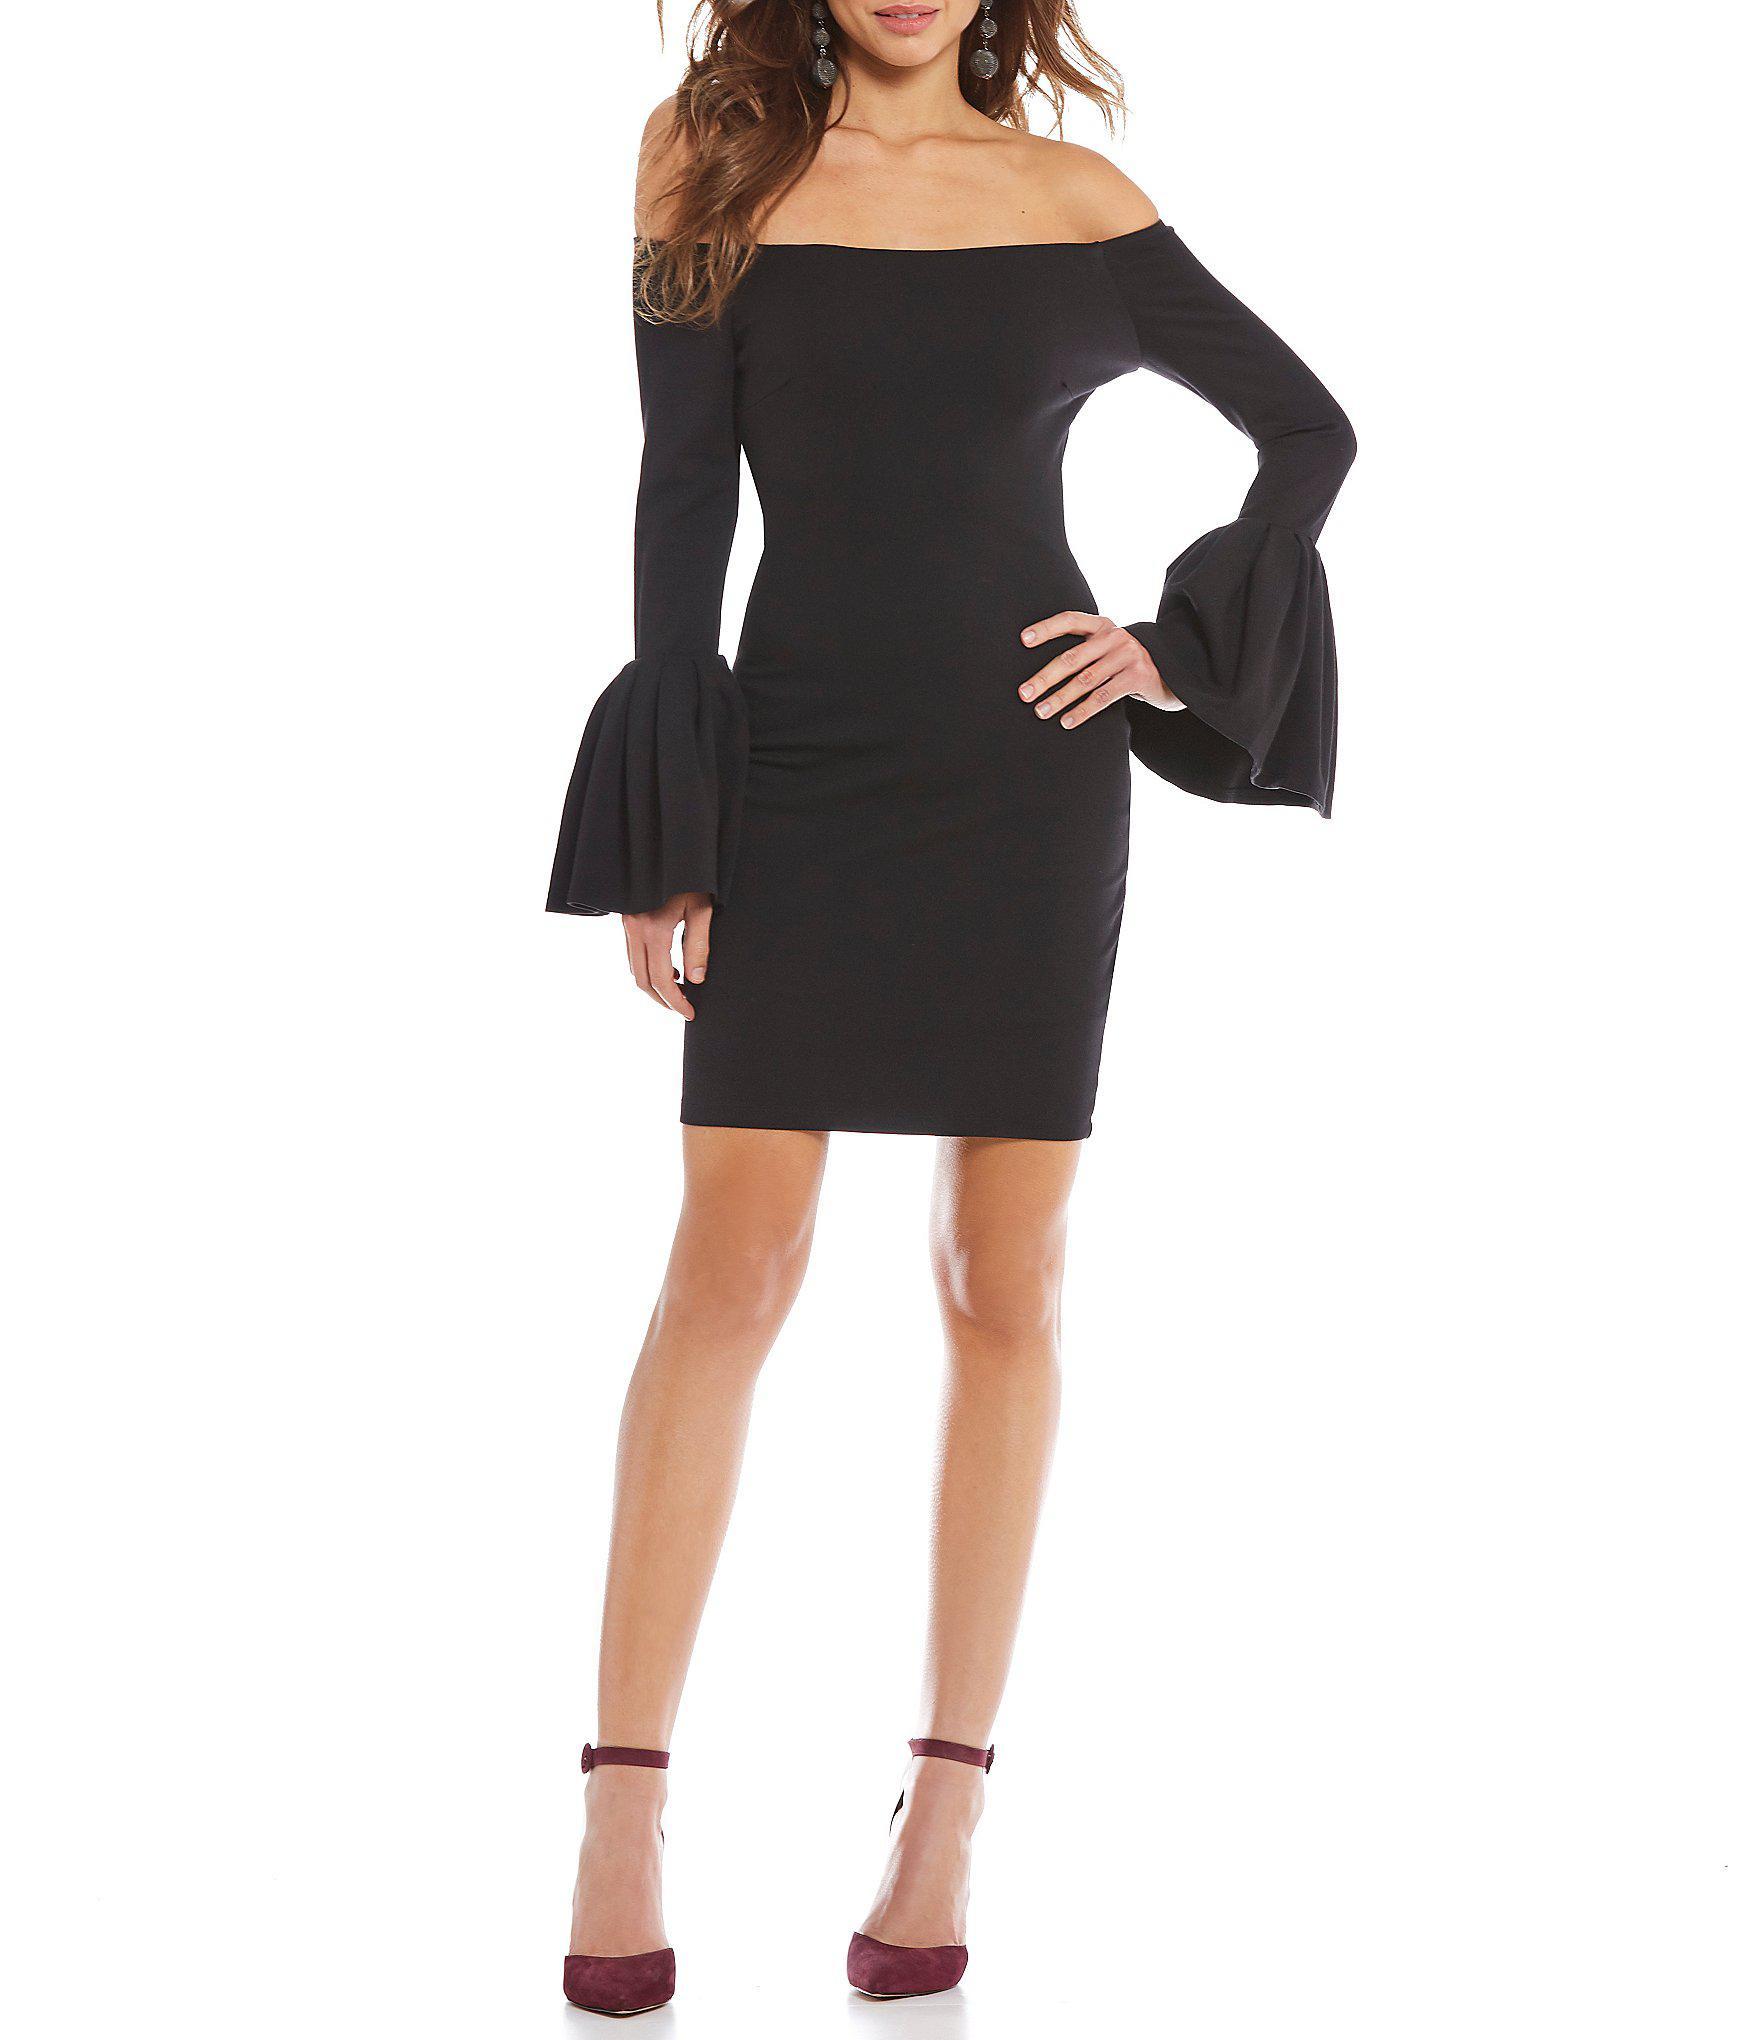 adeb68b4ad3 Gianni Bini Raissa Fluted Sleeve Dress in Black - Lyst